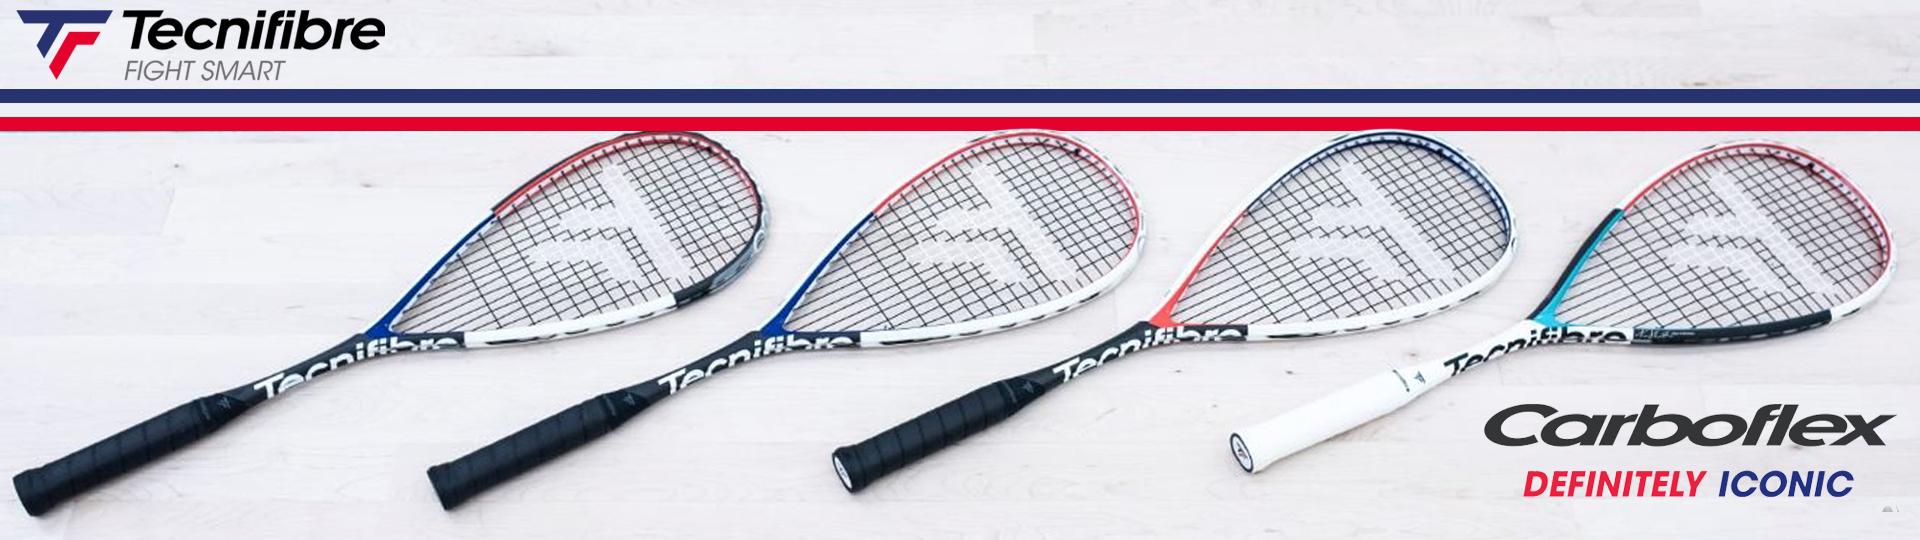 tecnifibre-squash-racquets-squash-only-australia-2021.jpg